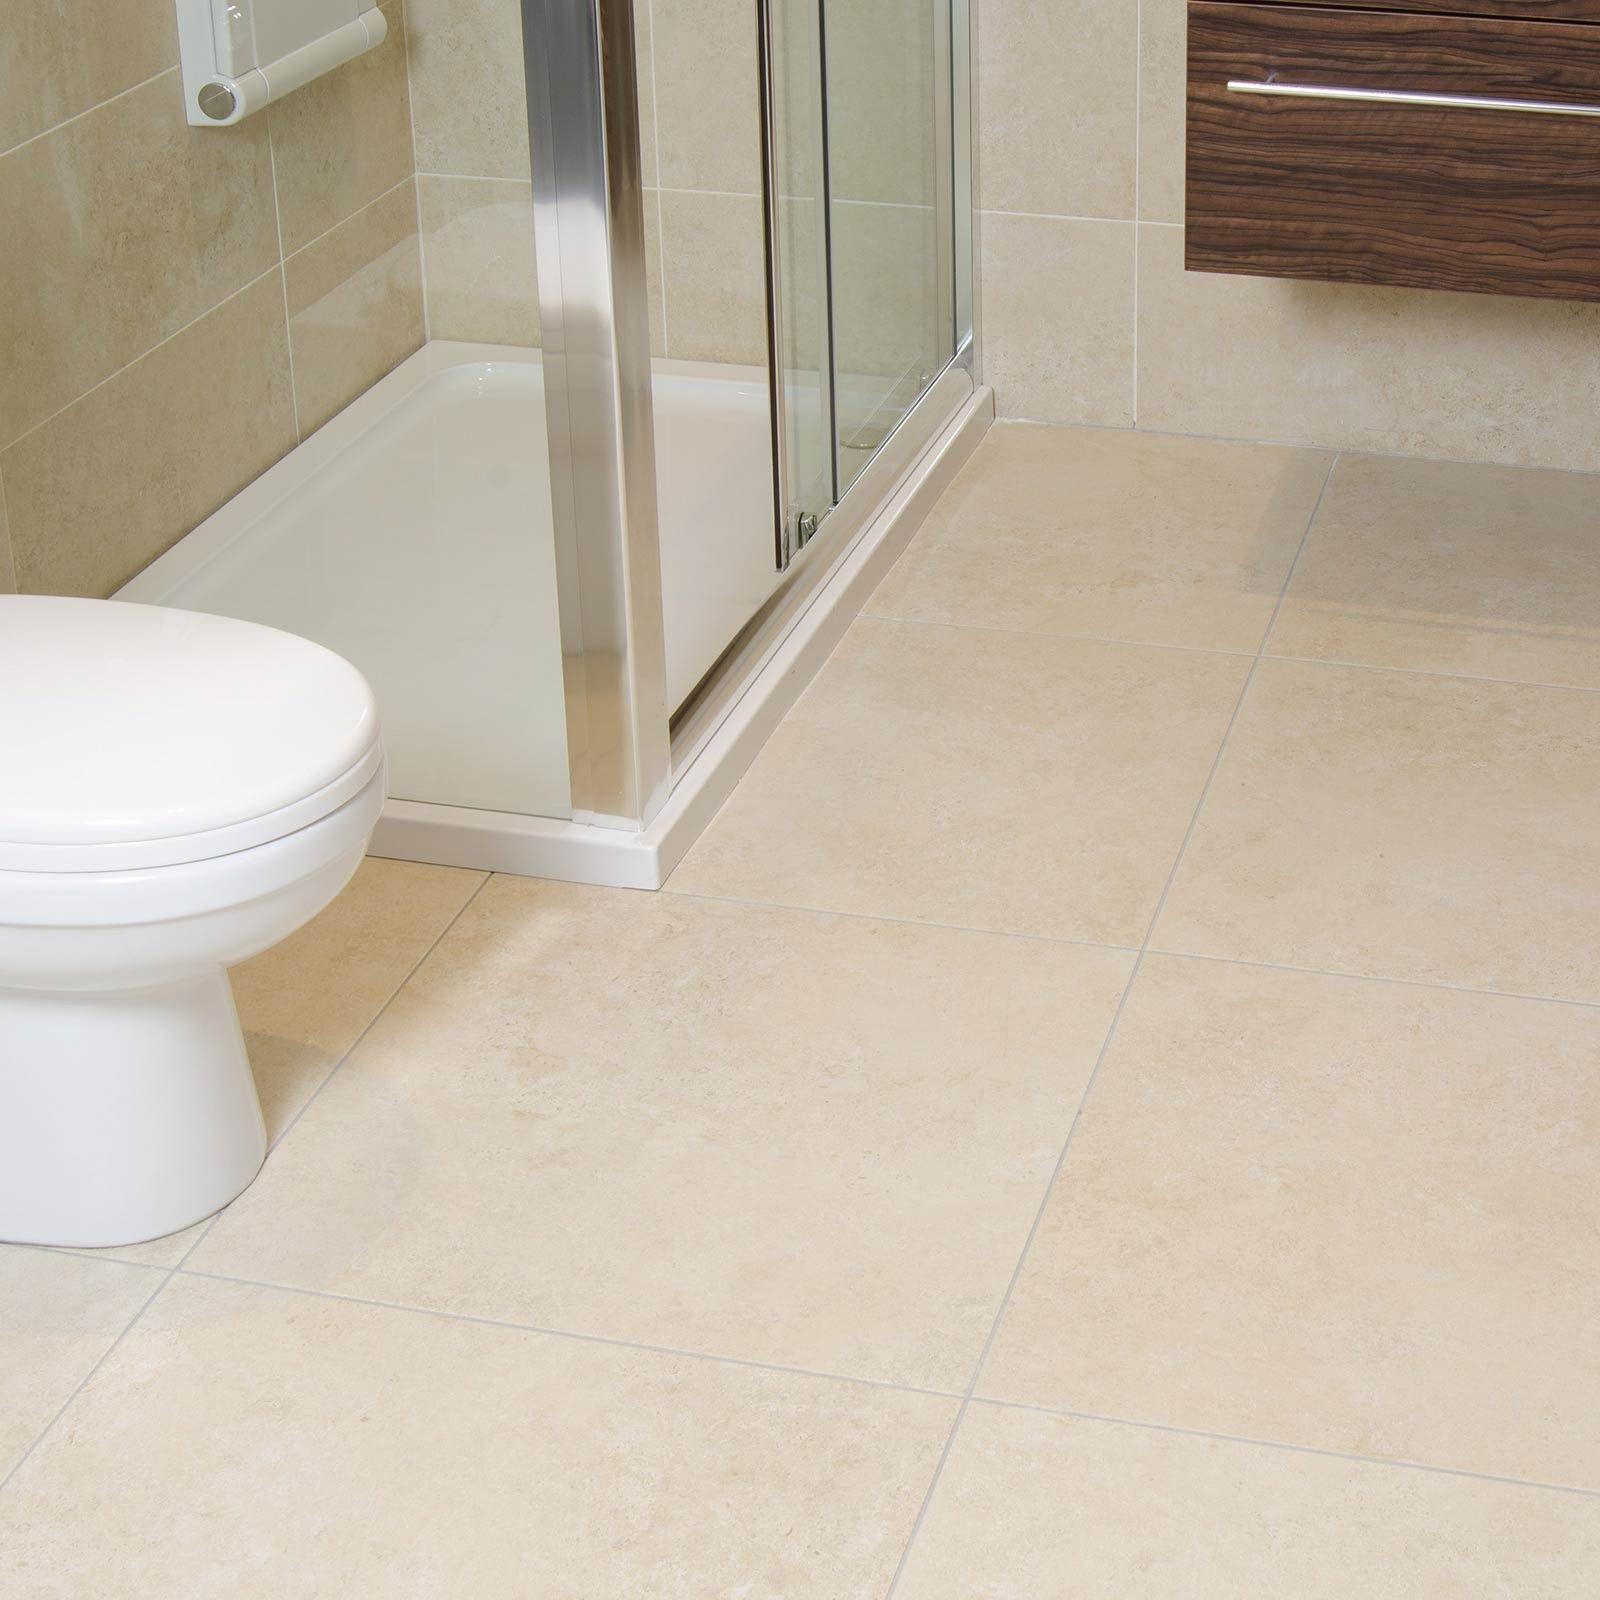 Nature Marfil Floor Tile Tile Floor Amazing Bathrooms Flooring